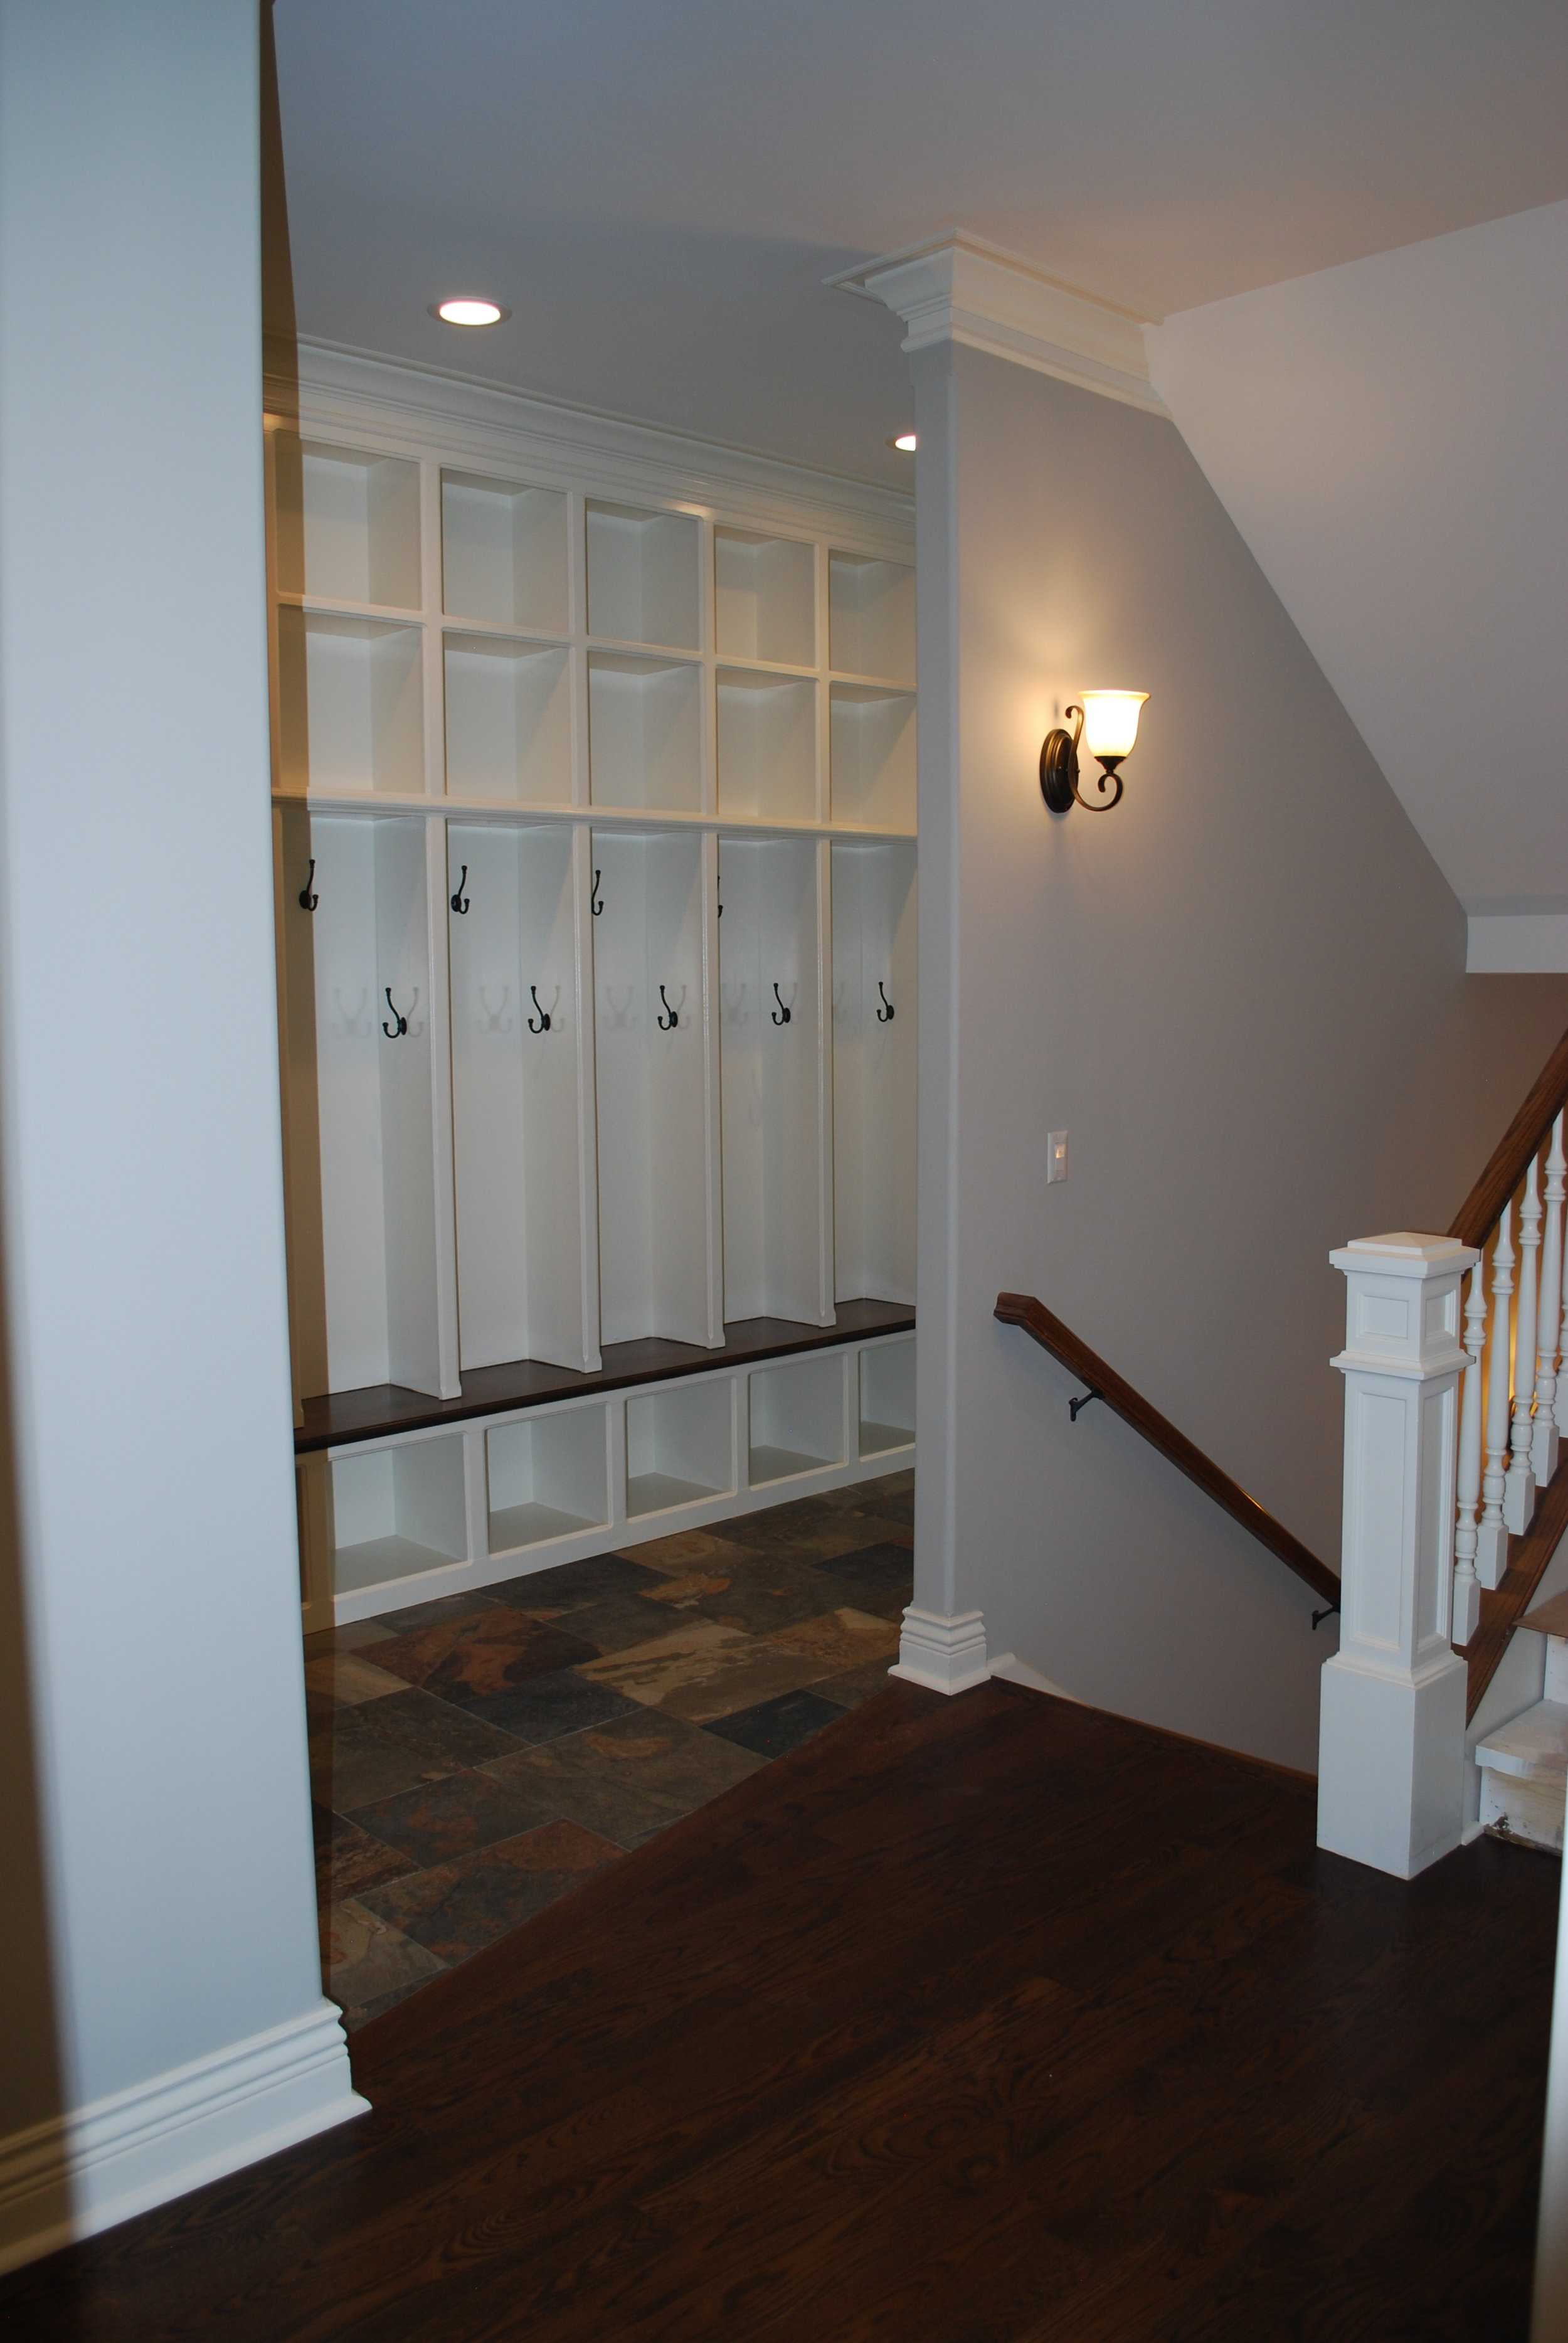 Mega Lockers in Mudroom Room